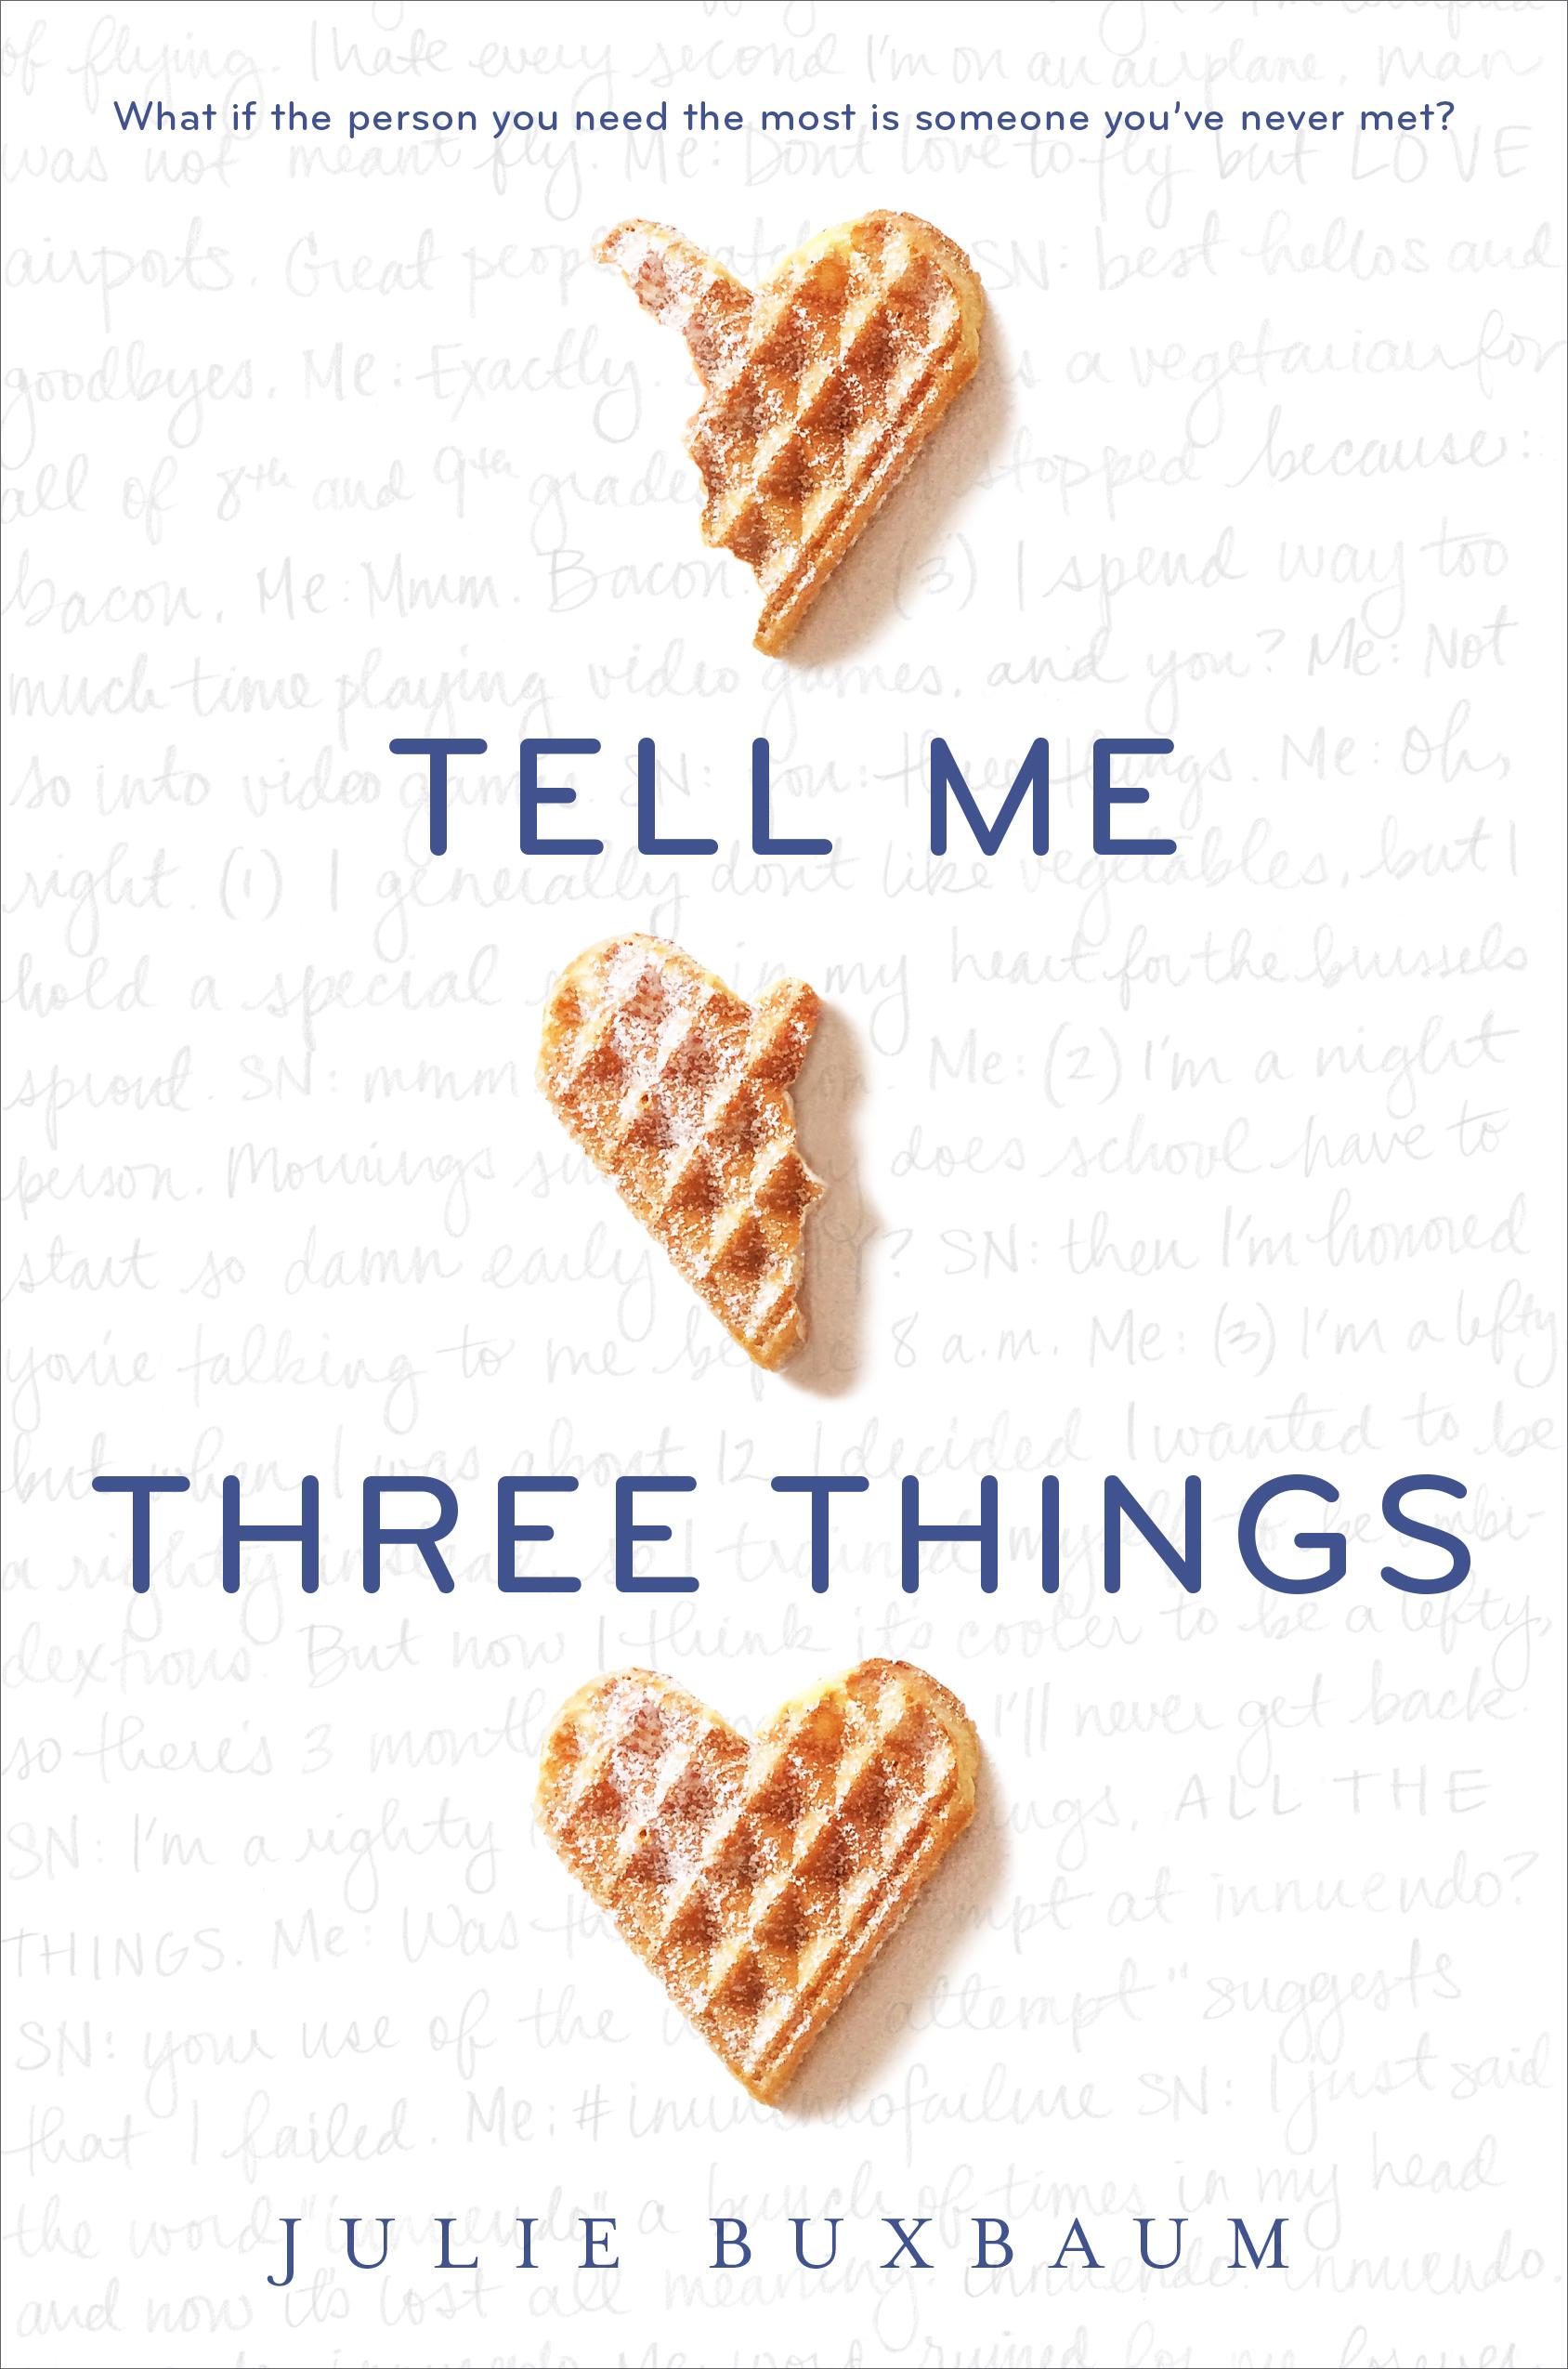 julie-buxbaum-tell-me-three-things.jpg